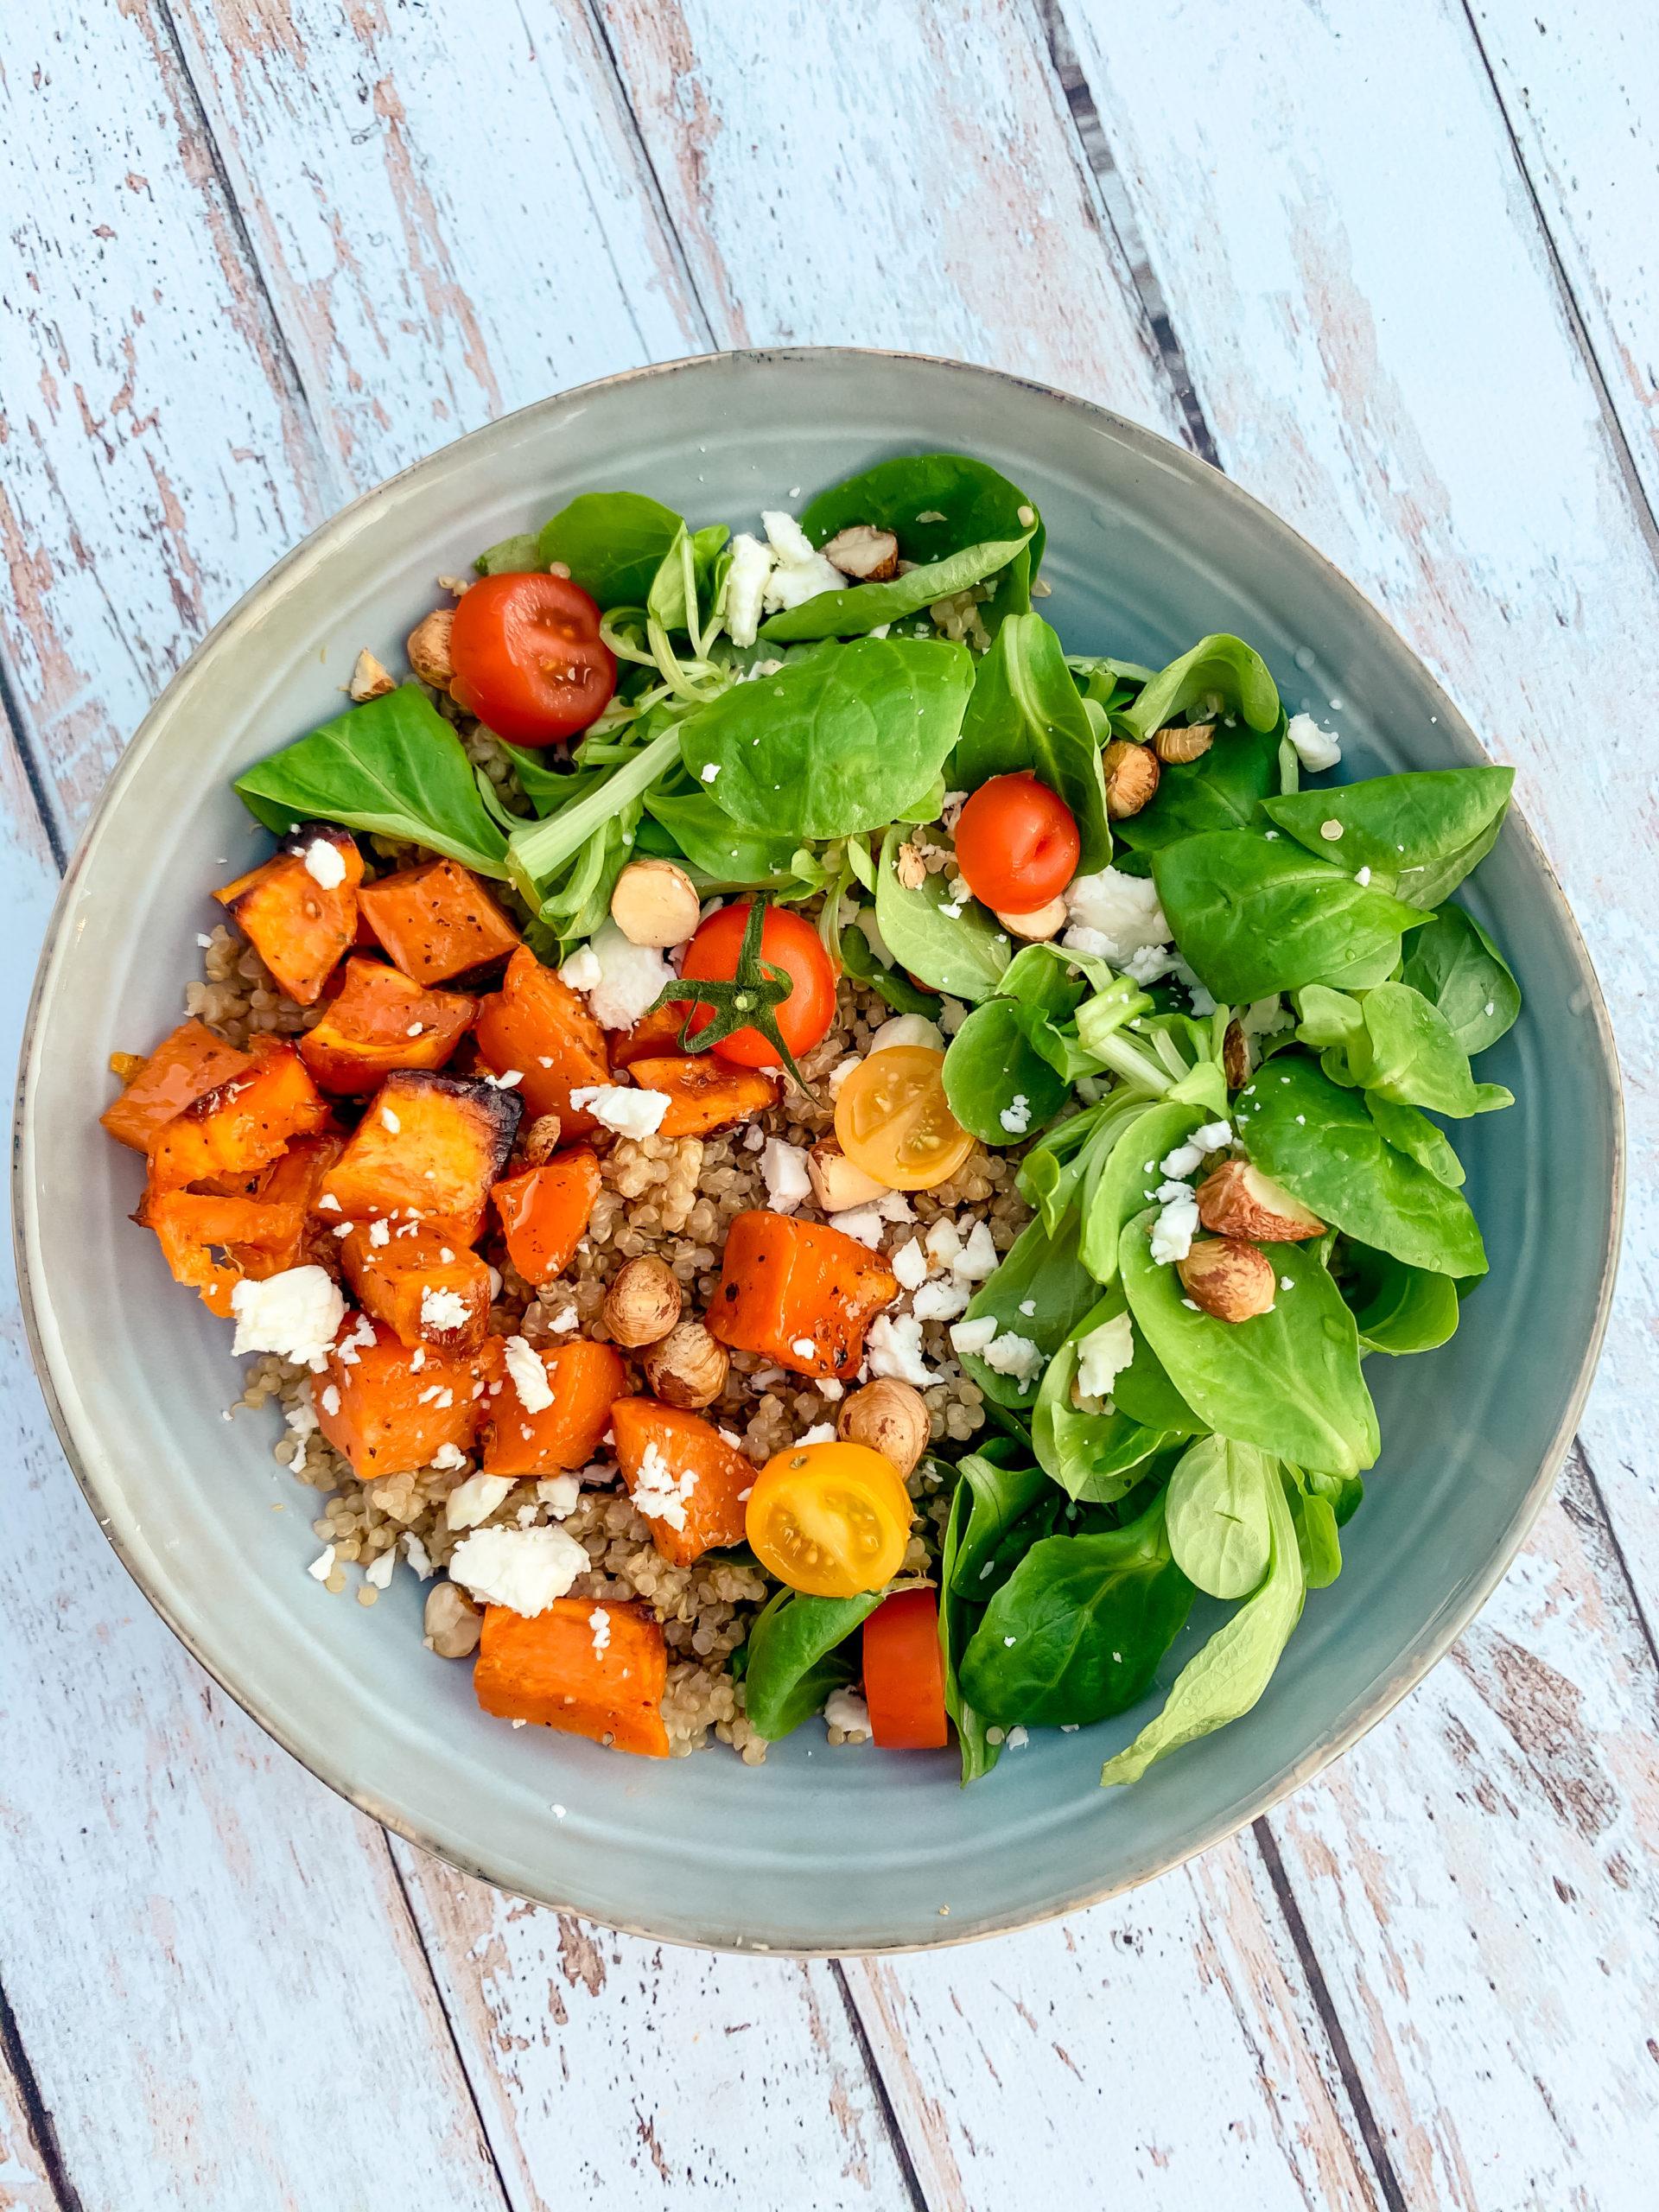 Salade de quinoa et patates douces roties